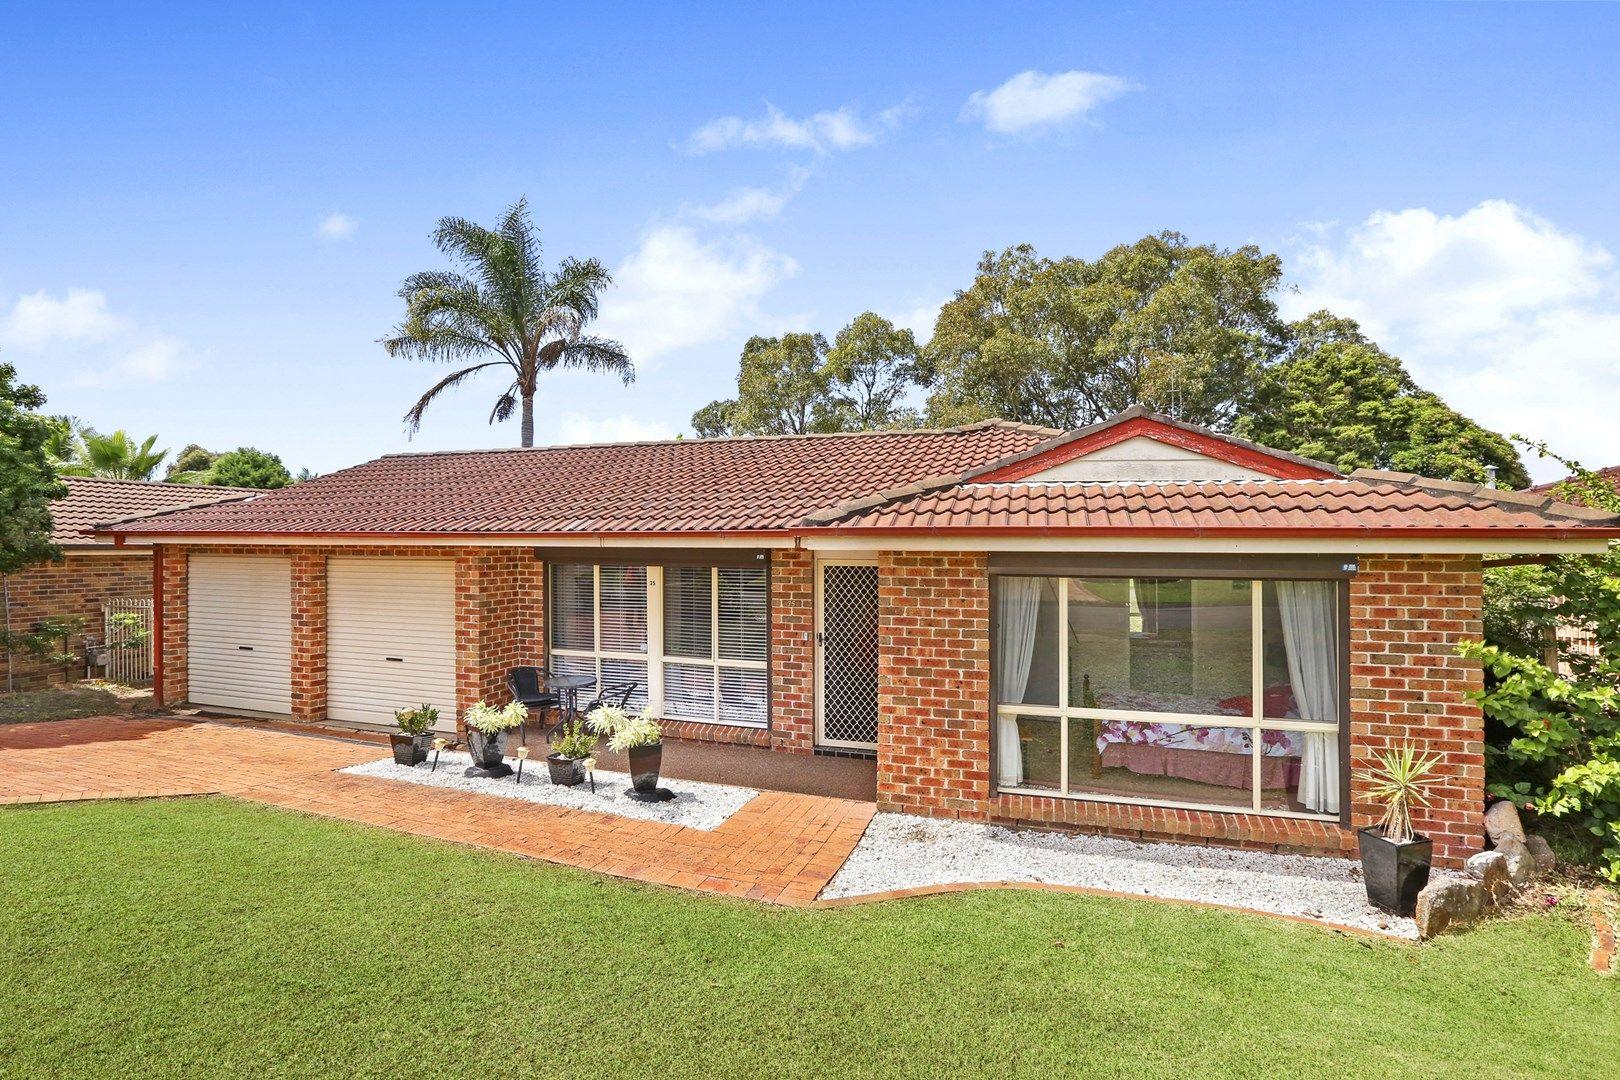 35 Twinlakes Drive, Lake Haven NSW 2263, Image 0